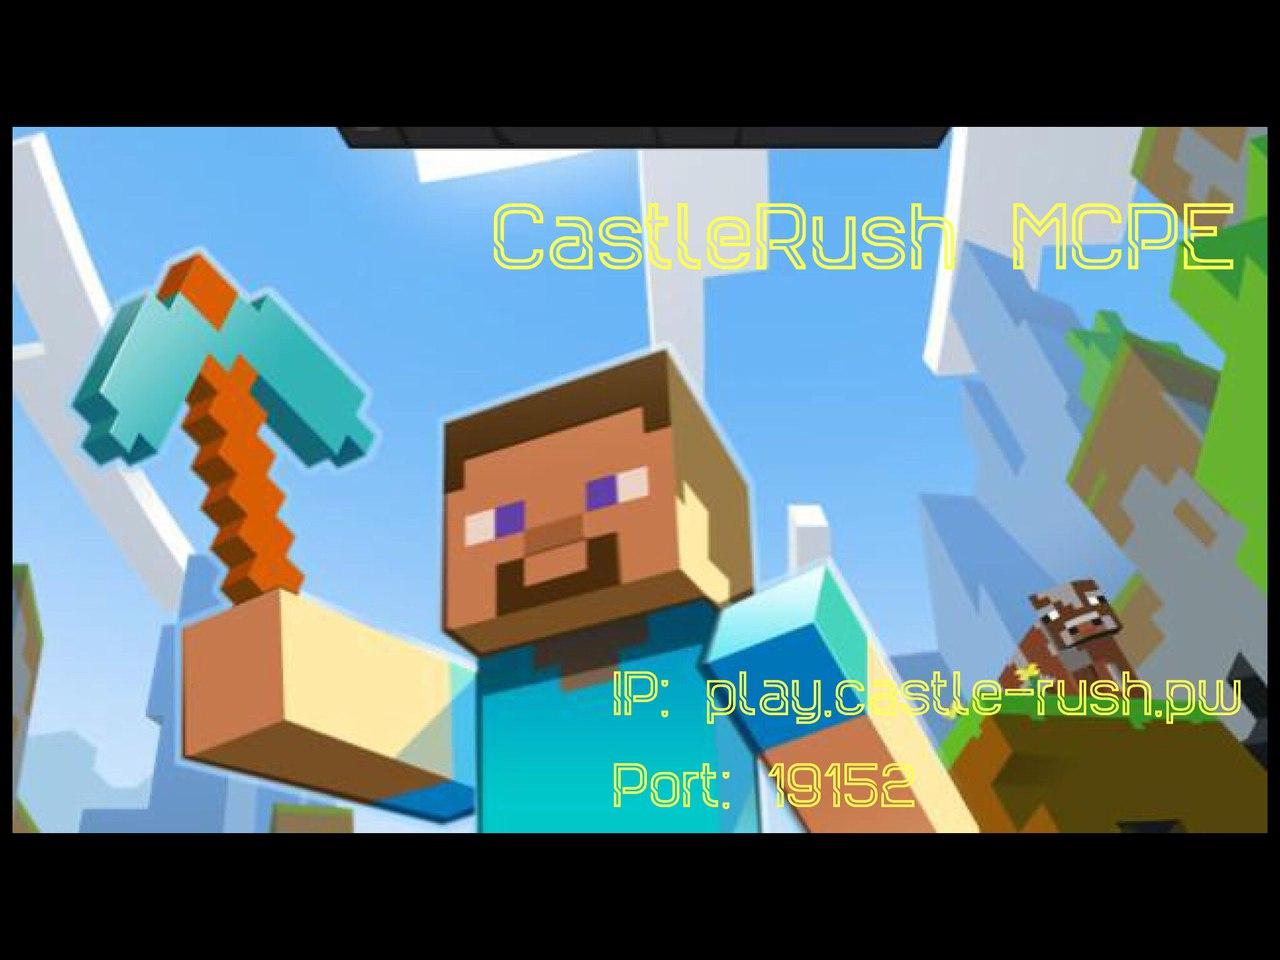 --------CastleRush MCPE--------